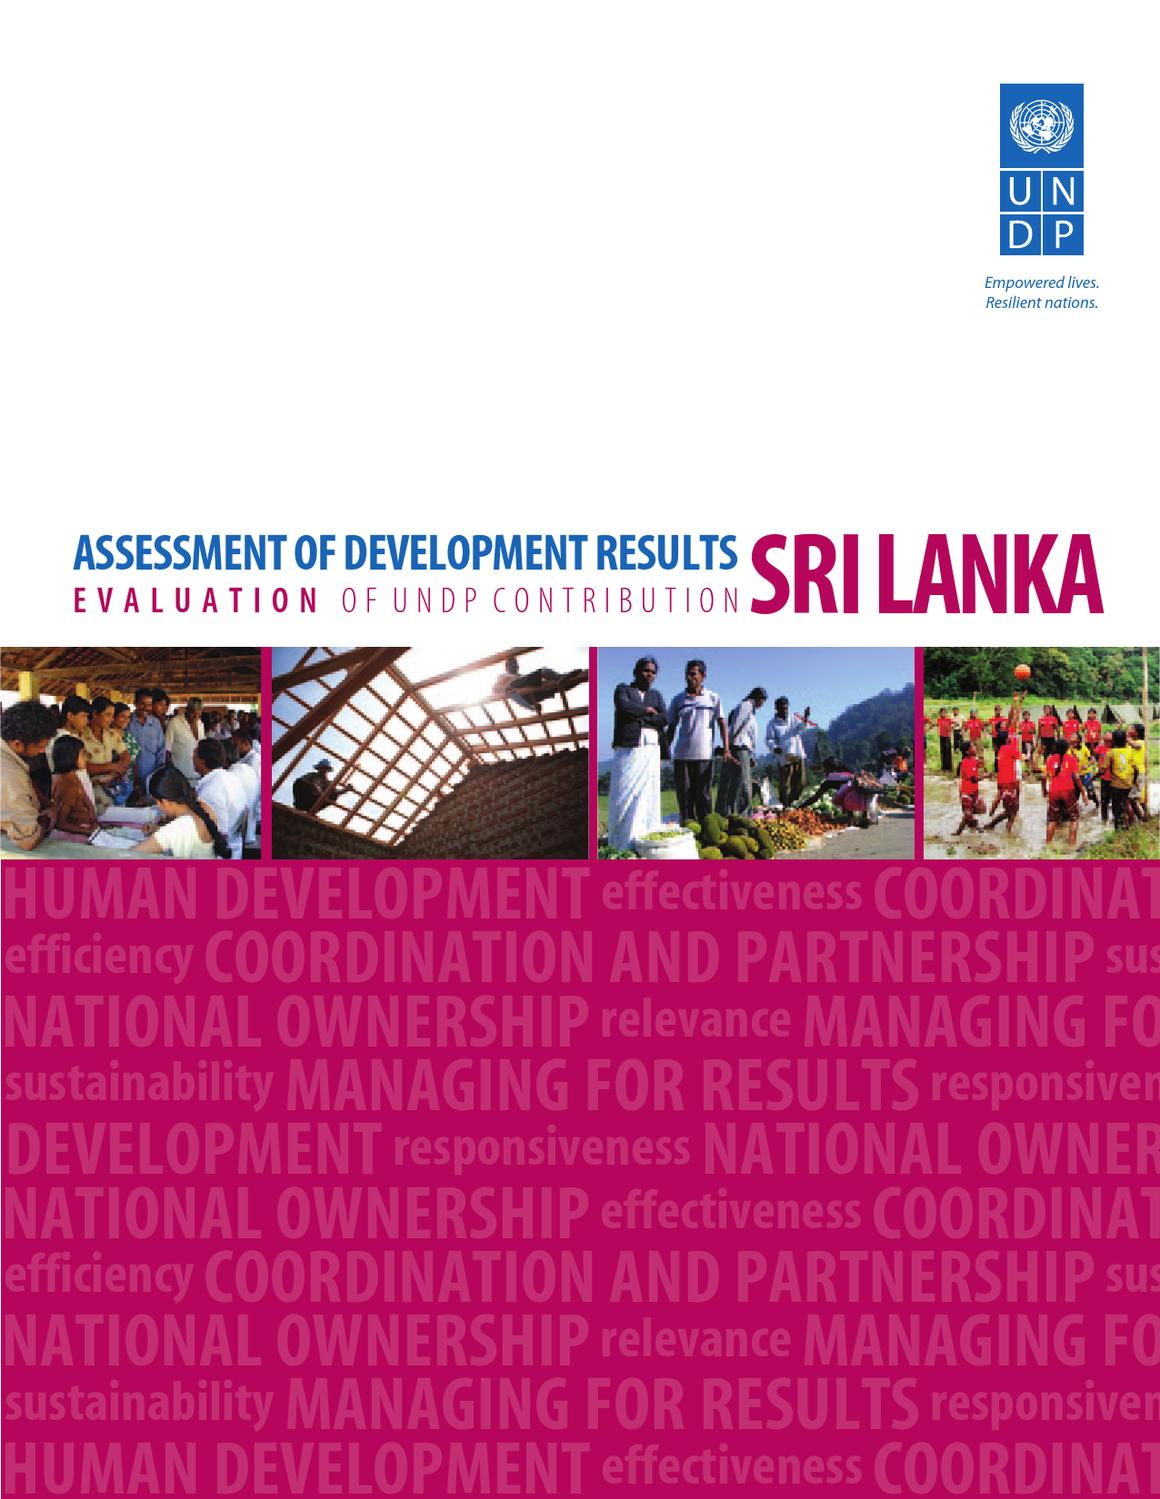 assessment of development results sri lanka by undp